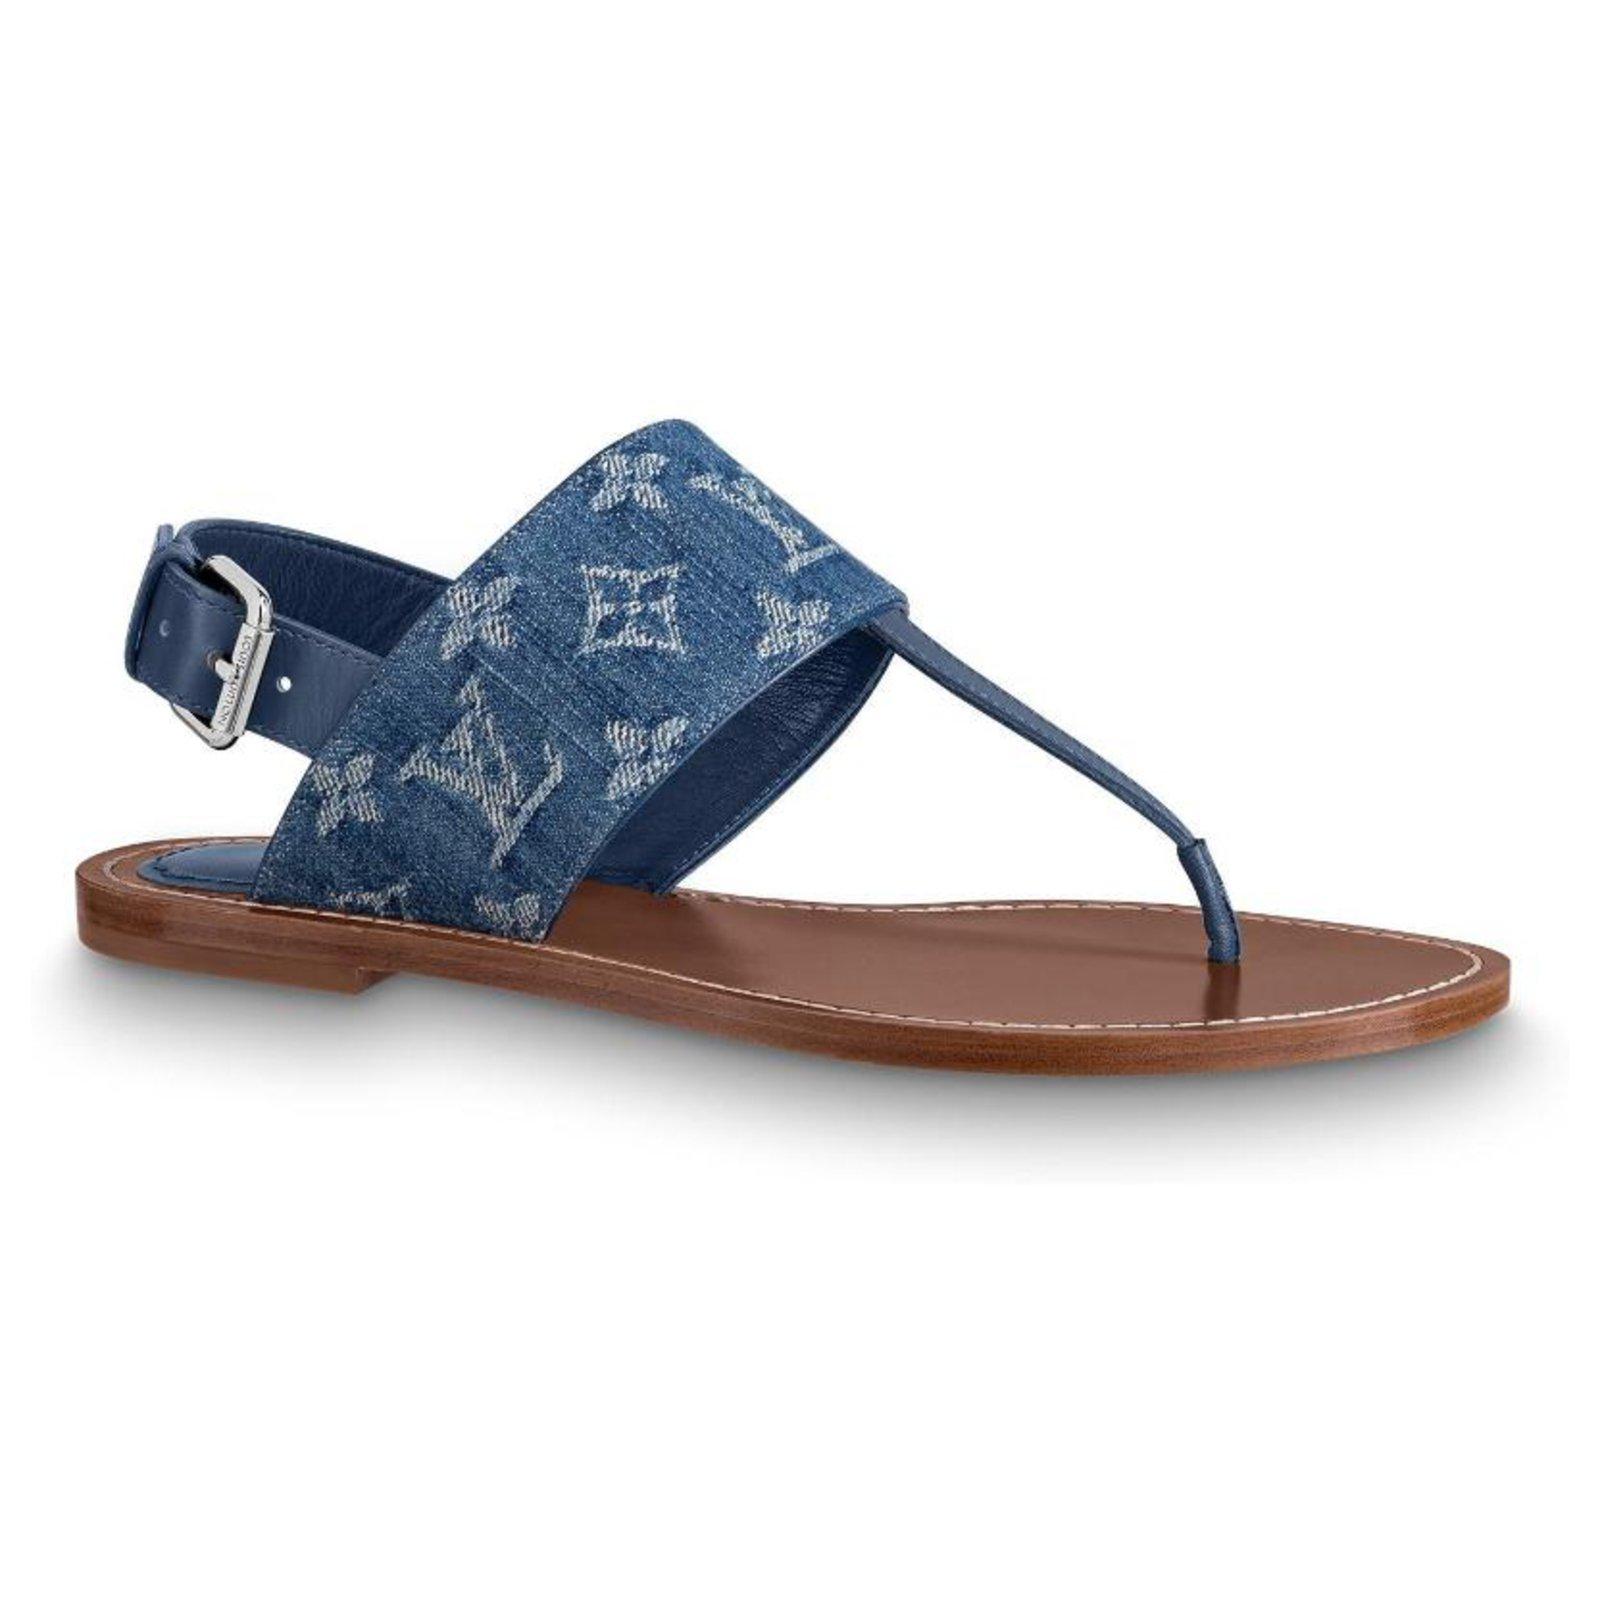 Louis Vuitton Starboard flat sandals